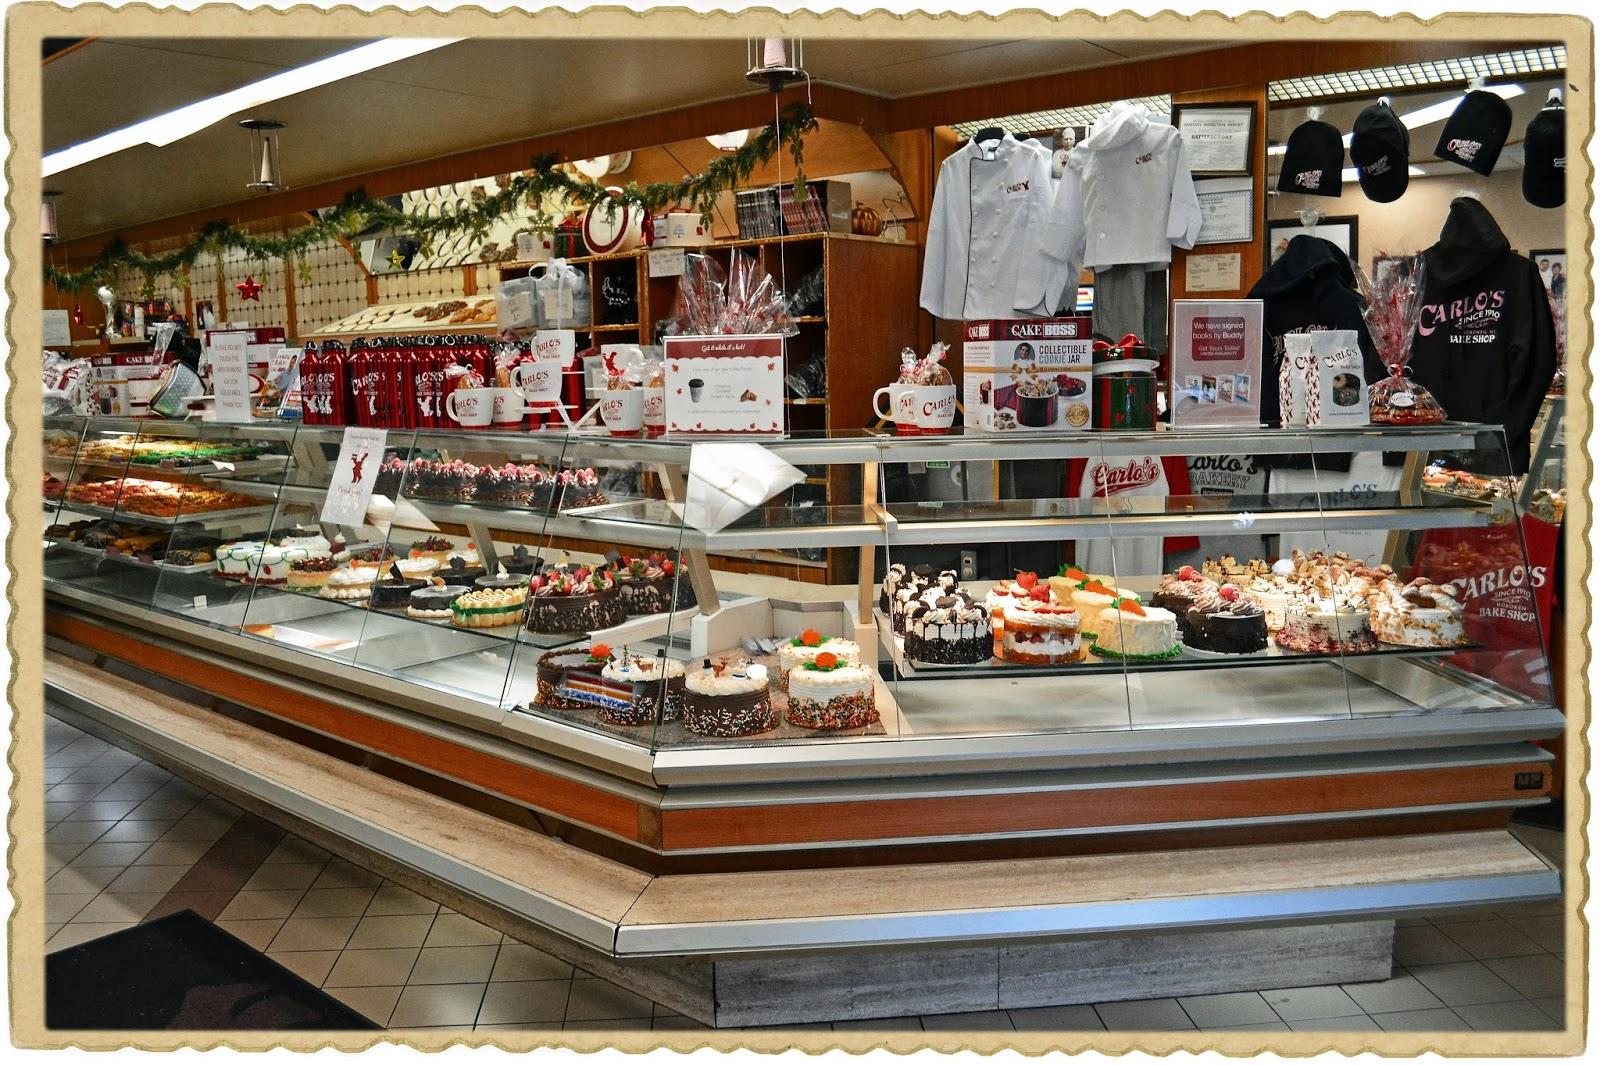 Carlos Cake Shop Prices